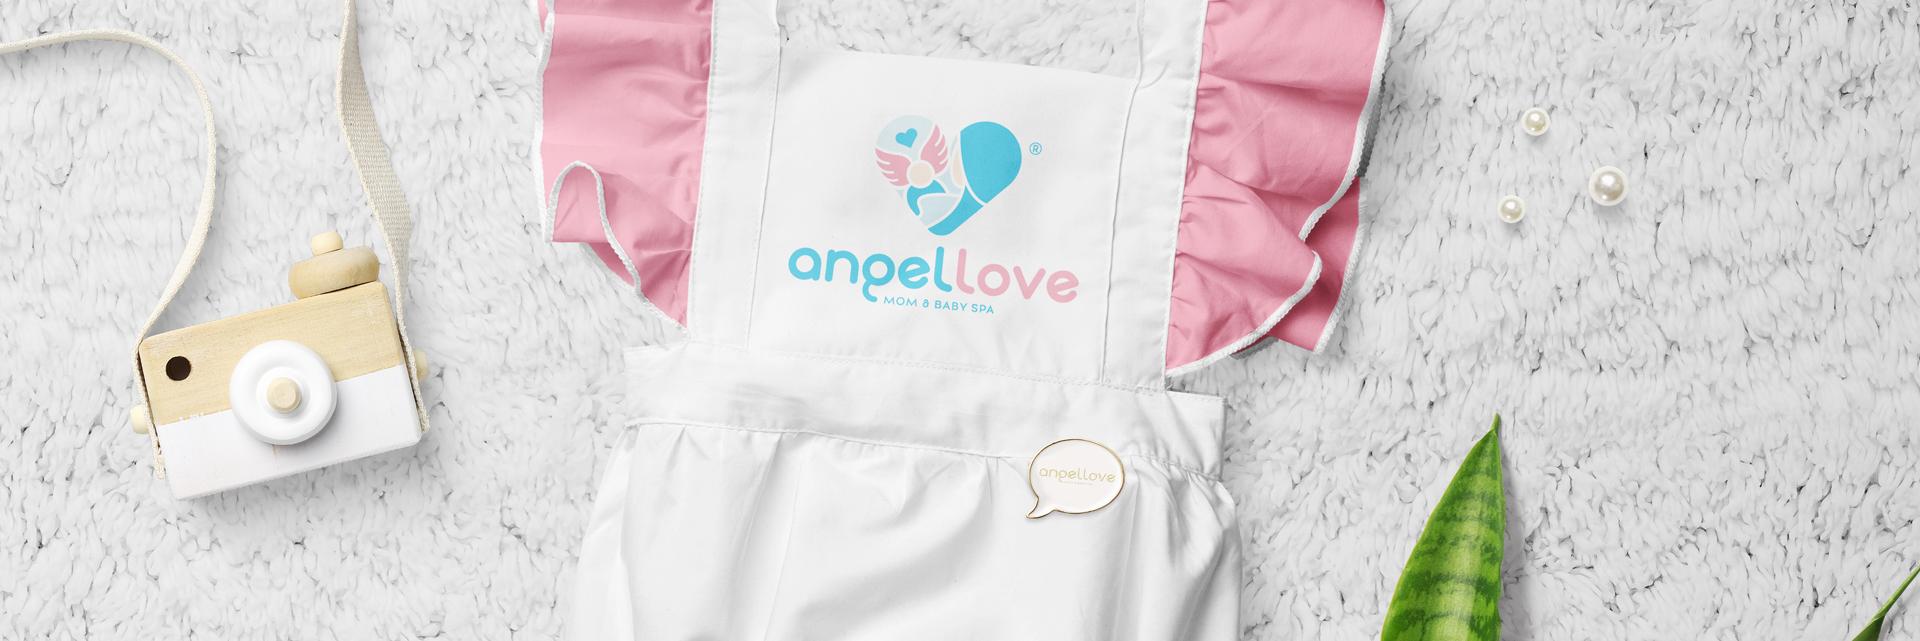 thiet_ke_thuong_hieu_logo_dep_angellove_slide02